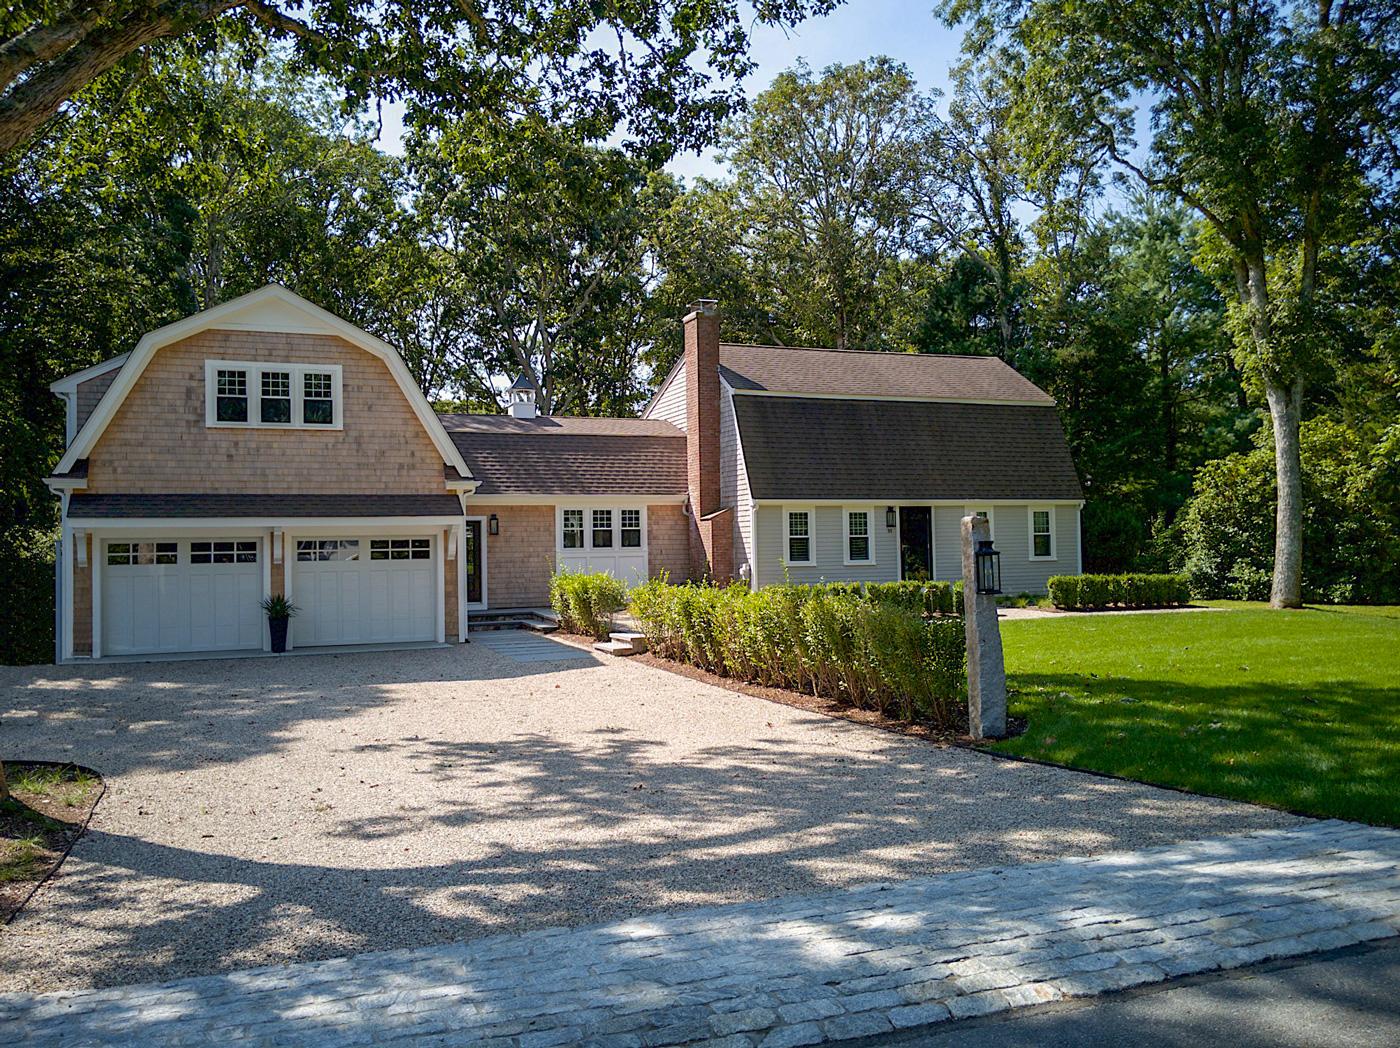 Cape Cod home renovation by Longfellow Design Build